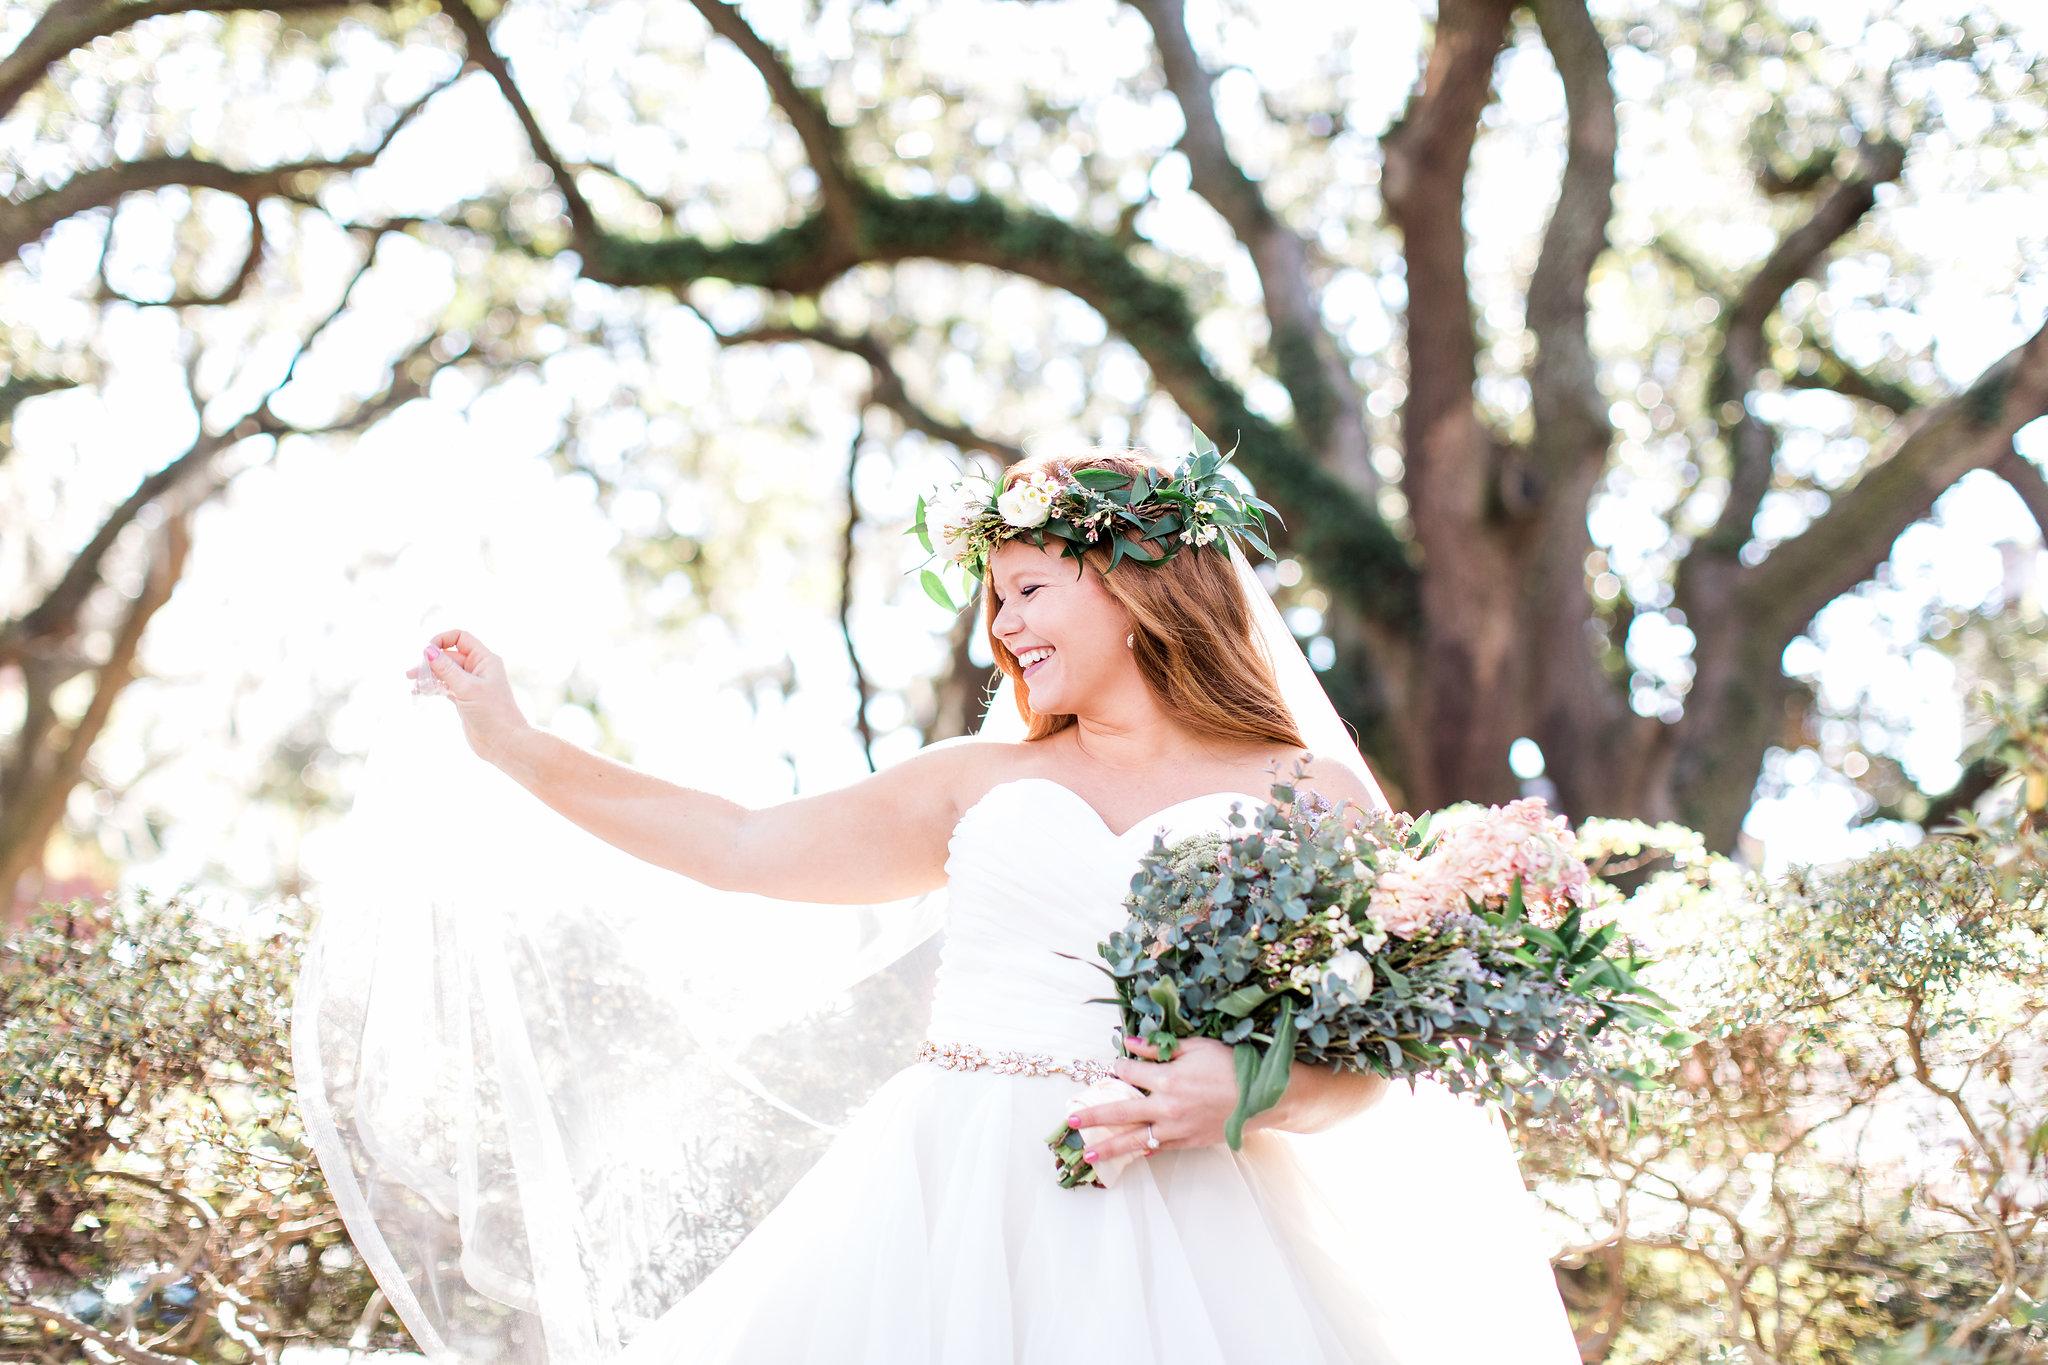 apt-b-photography-mary-elizabeths-bridal-boutique-adele-amelia-accessories-morilee-5504-savannah-bridal-boutique-savannah-weddings-savannah-wedding-photographer-savannah-bridal-gowns-savannah-wedding-dresses-historic-savannah-wedding-8.jpg